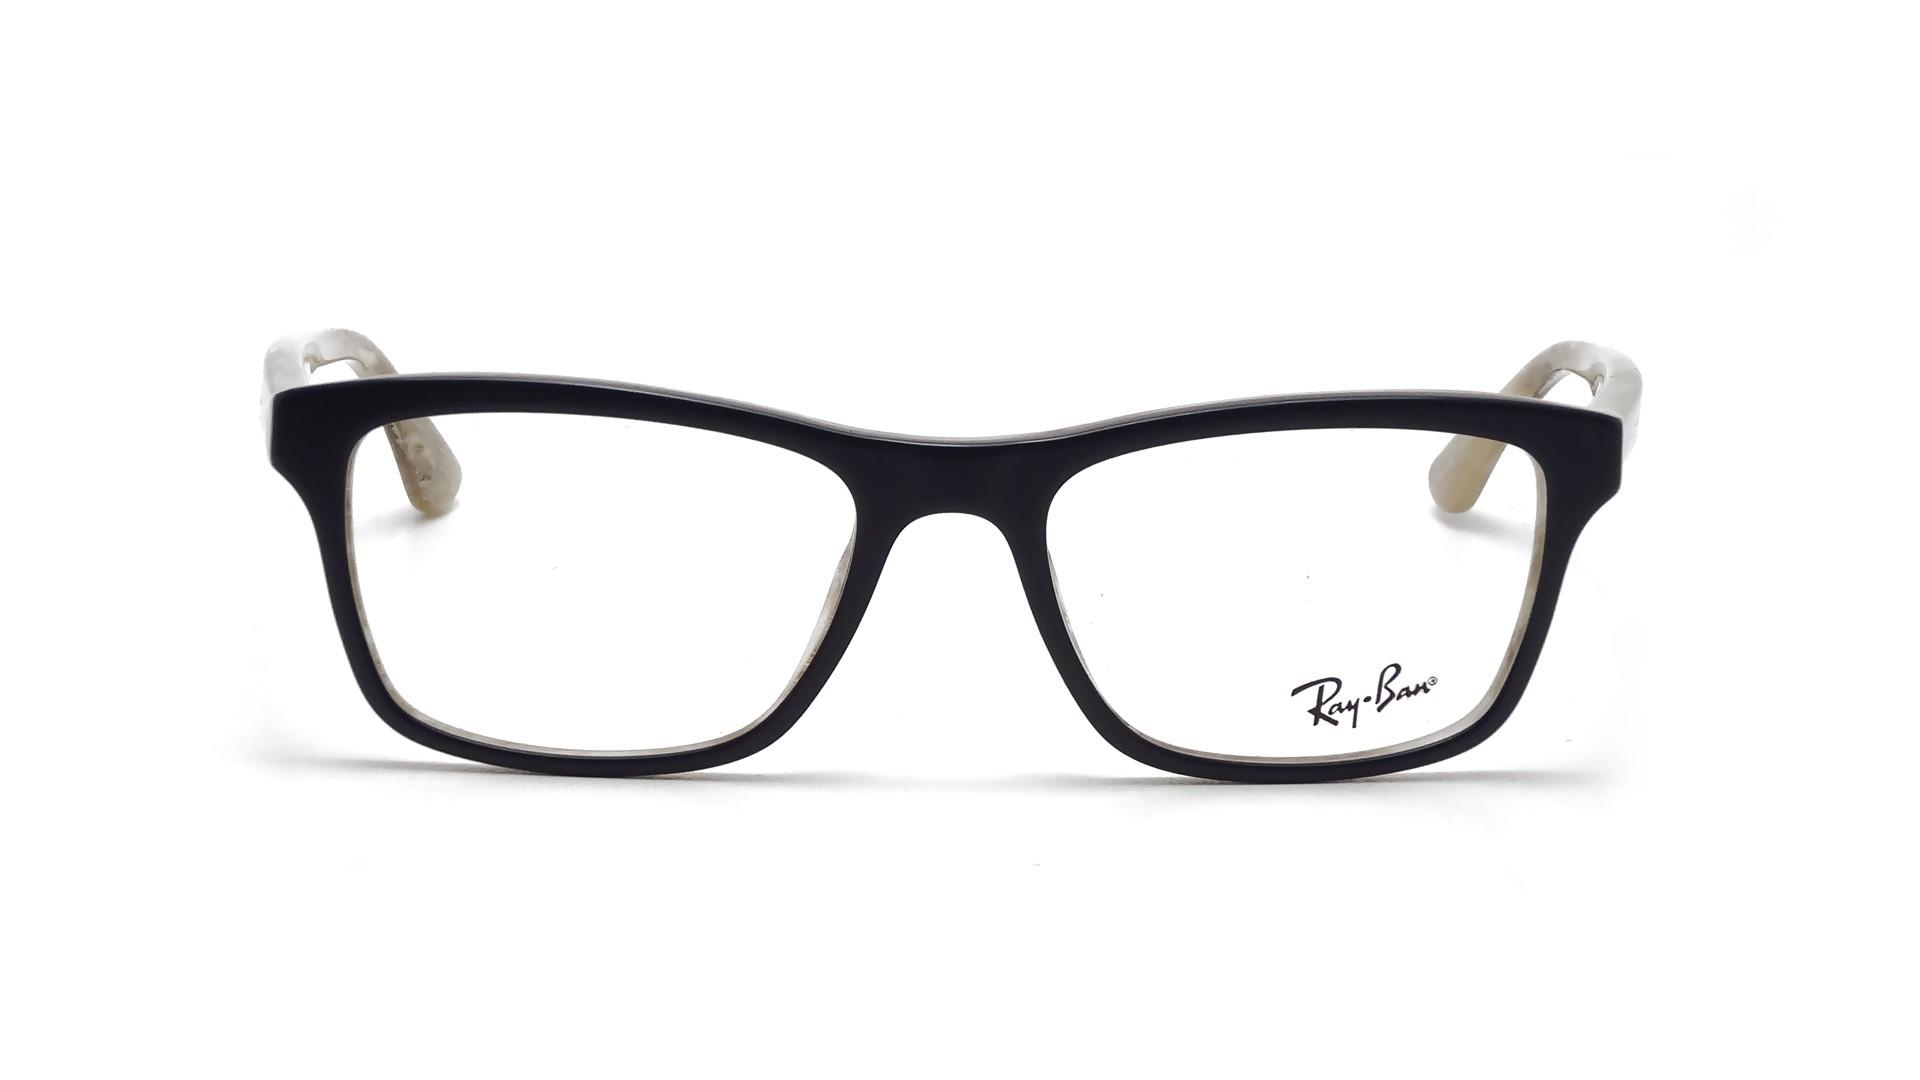 ray ban rx5279 eyeglasses